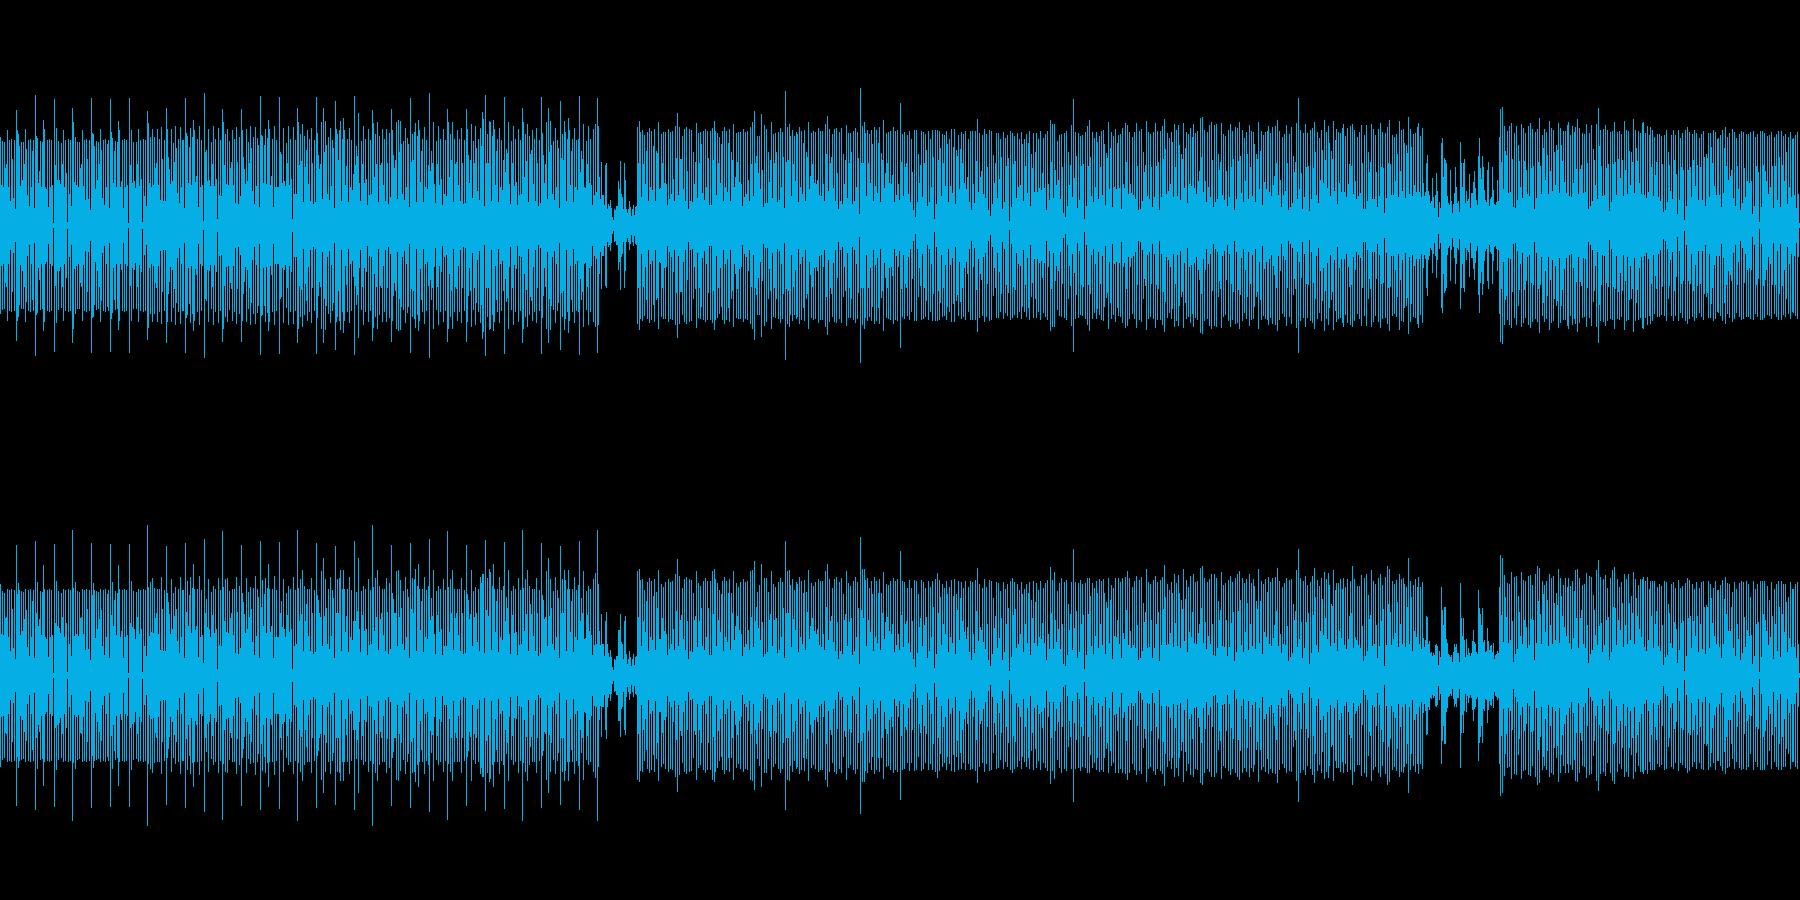 jazzの要素を取り入れたハウス、テクノの再生済みの波形